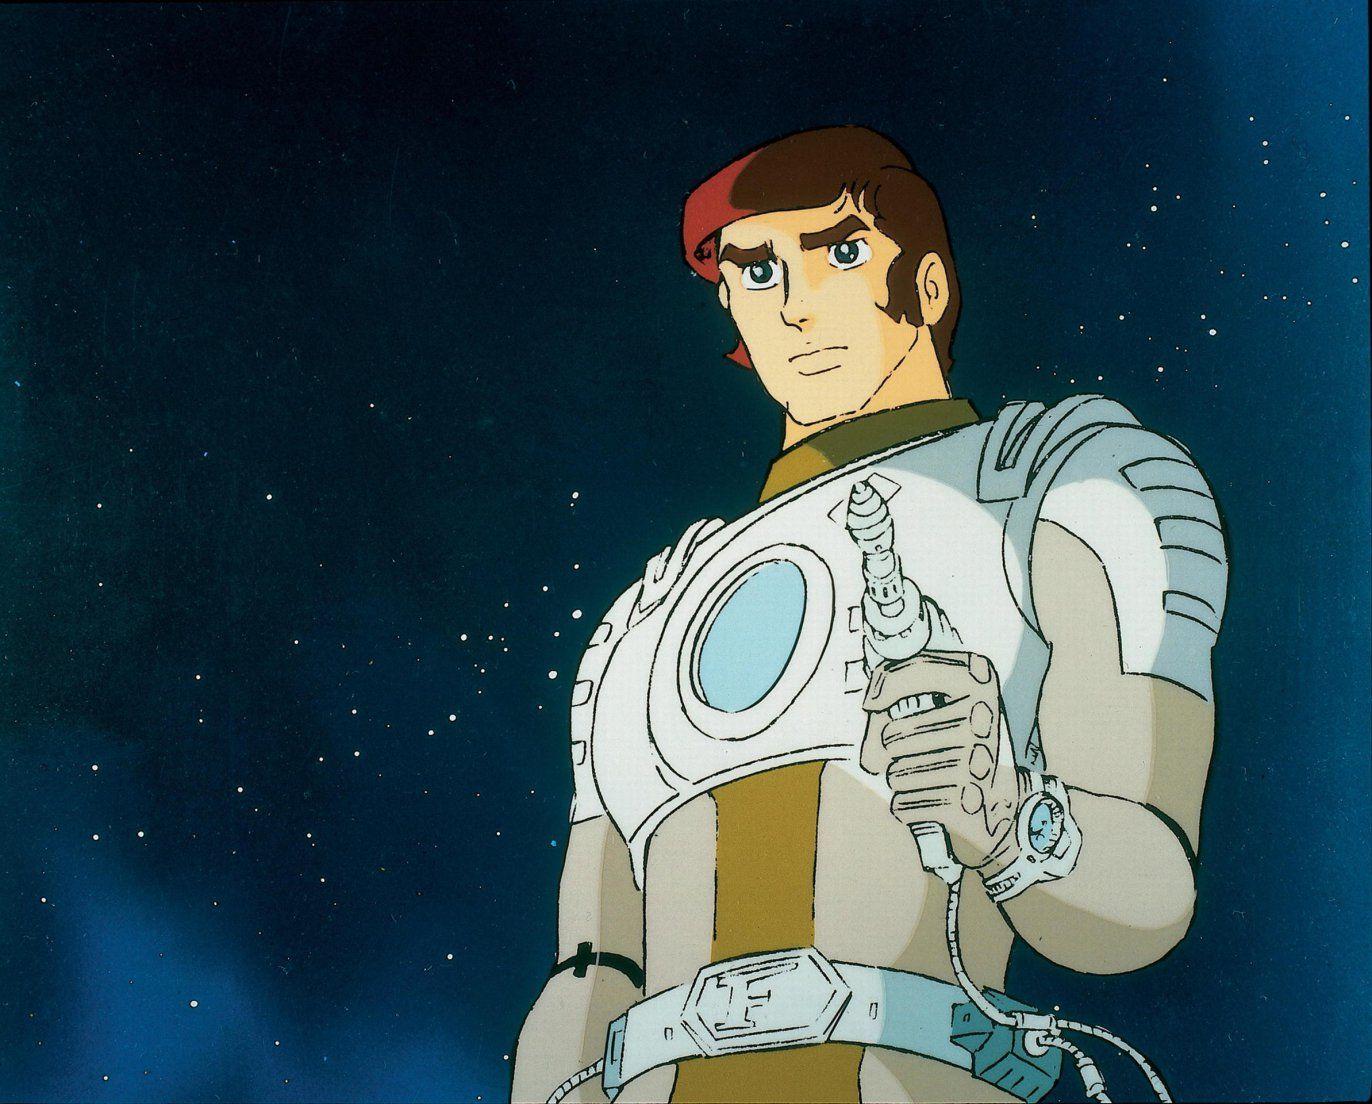 Animated series captain future 1978 anime classic